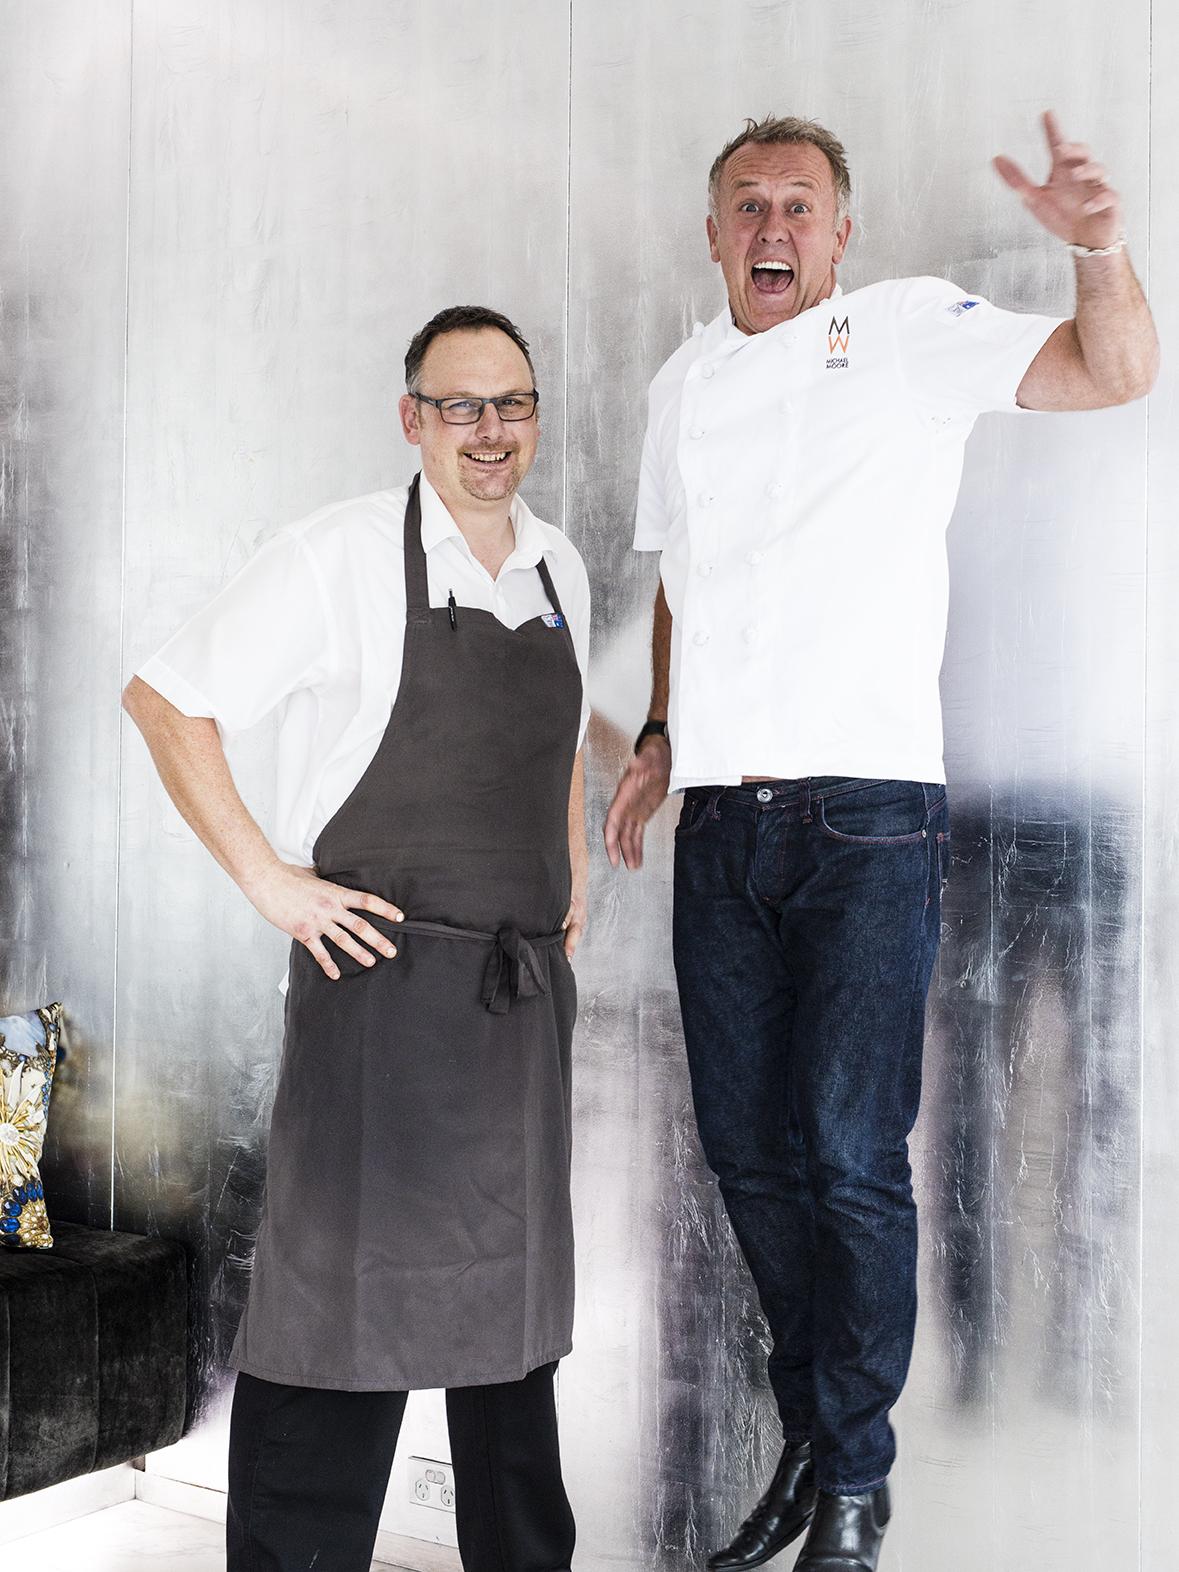 Exec. Chef Darren Templeman & Director of O Bar & Dining Michael Moore